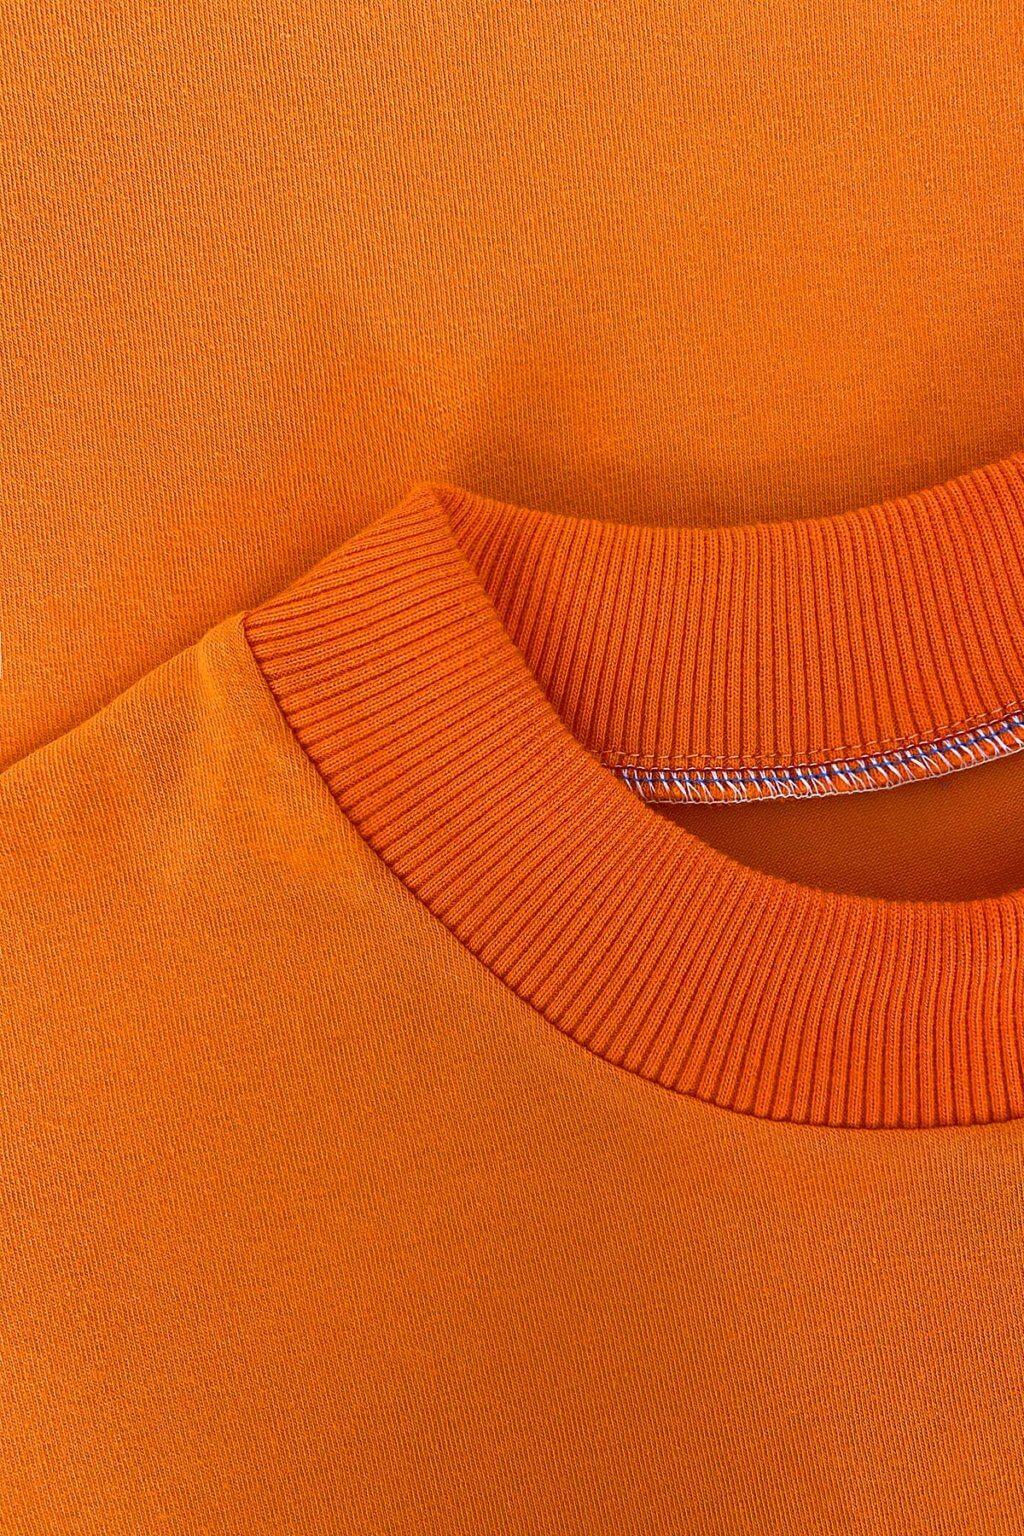 T-shirt-orange-5